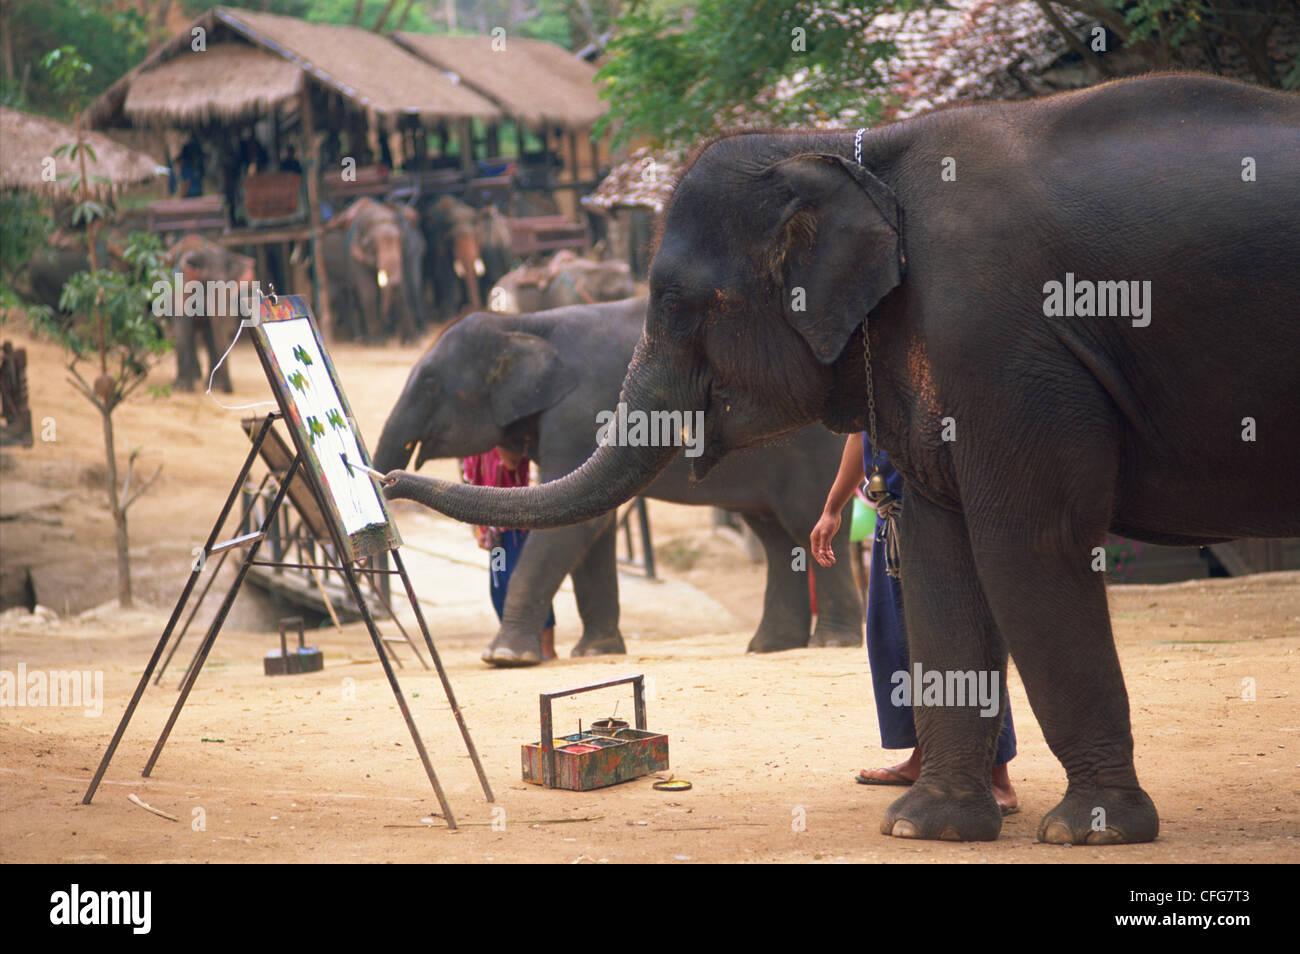 Thailand, Chiang Mai, Mae Sa Elephant Camp, Elephant Show, Elephant Painting with Trunk - Stock Image